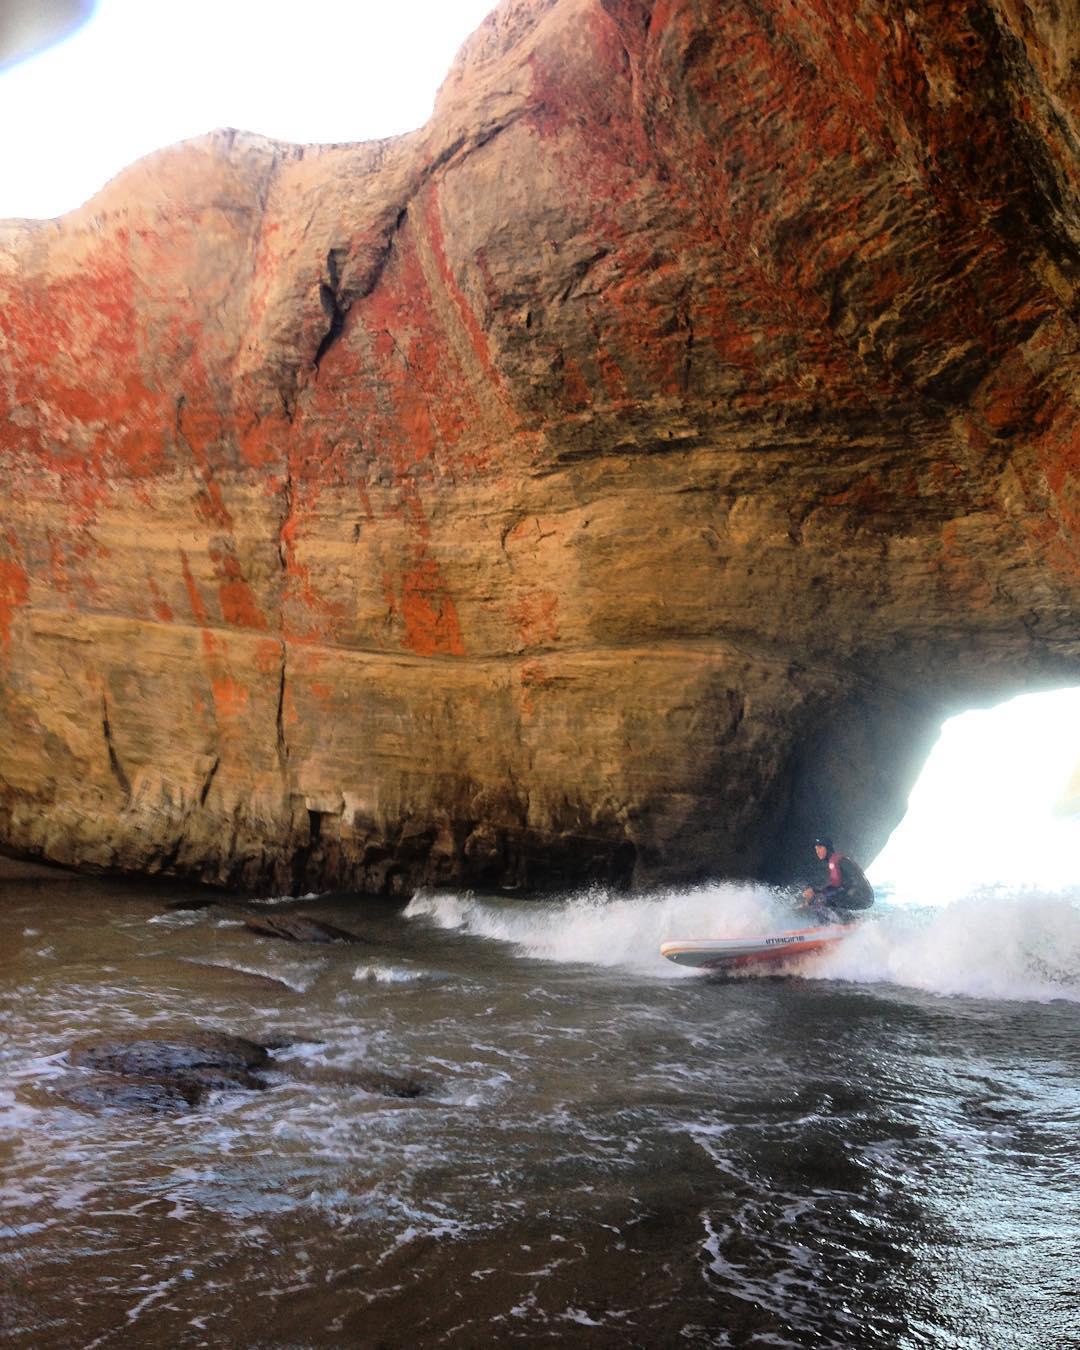 Down to surf whatever  #showupandblowup #imaginesurf #tbt #shivermetimbers #melekalikimaka #standupjournal #bamboopaddle #paddlehawaii #kaenon #navitasnaturals #rareform #itakebioastin